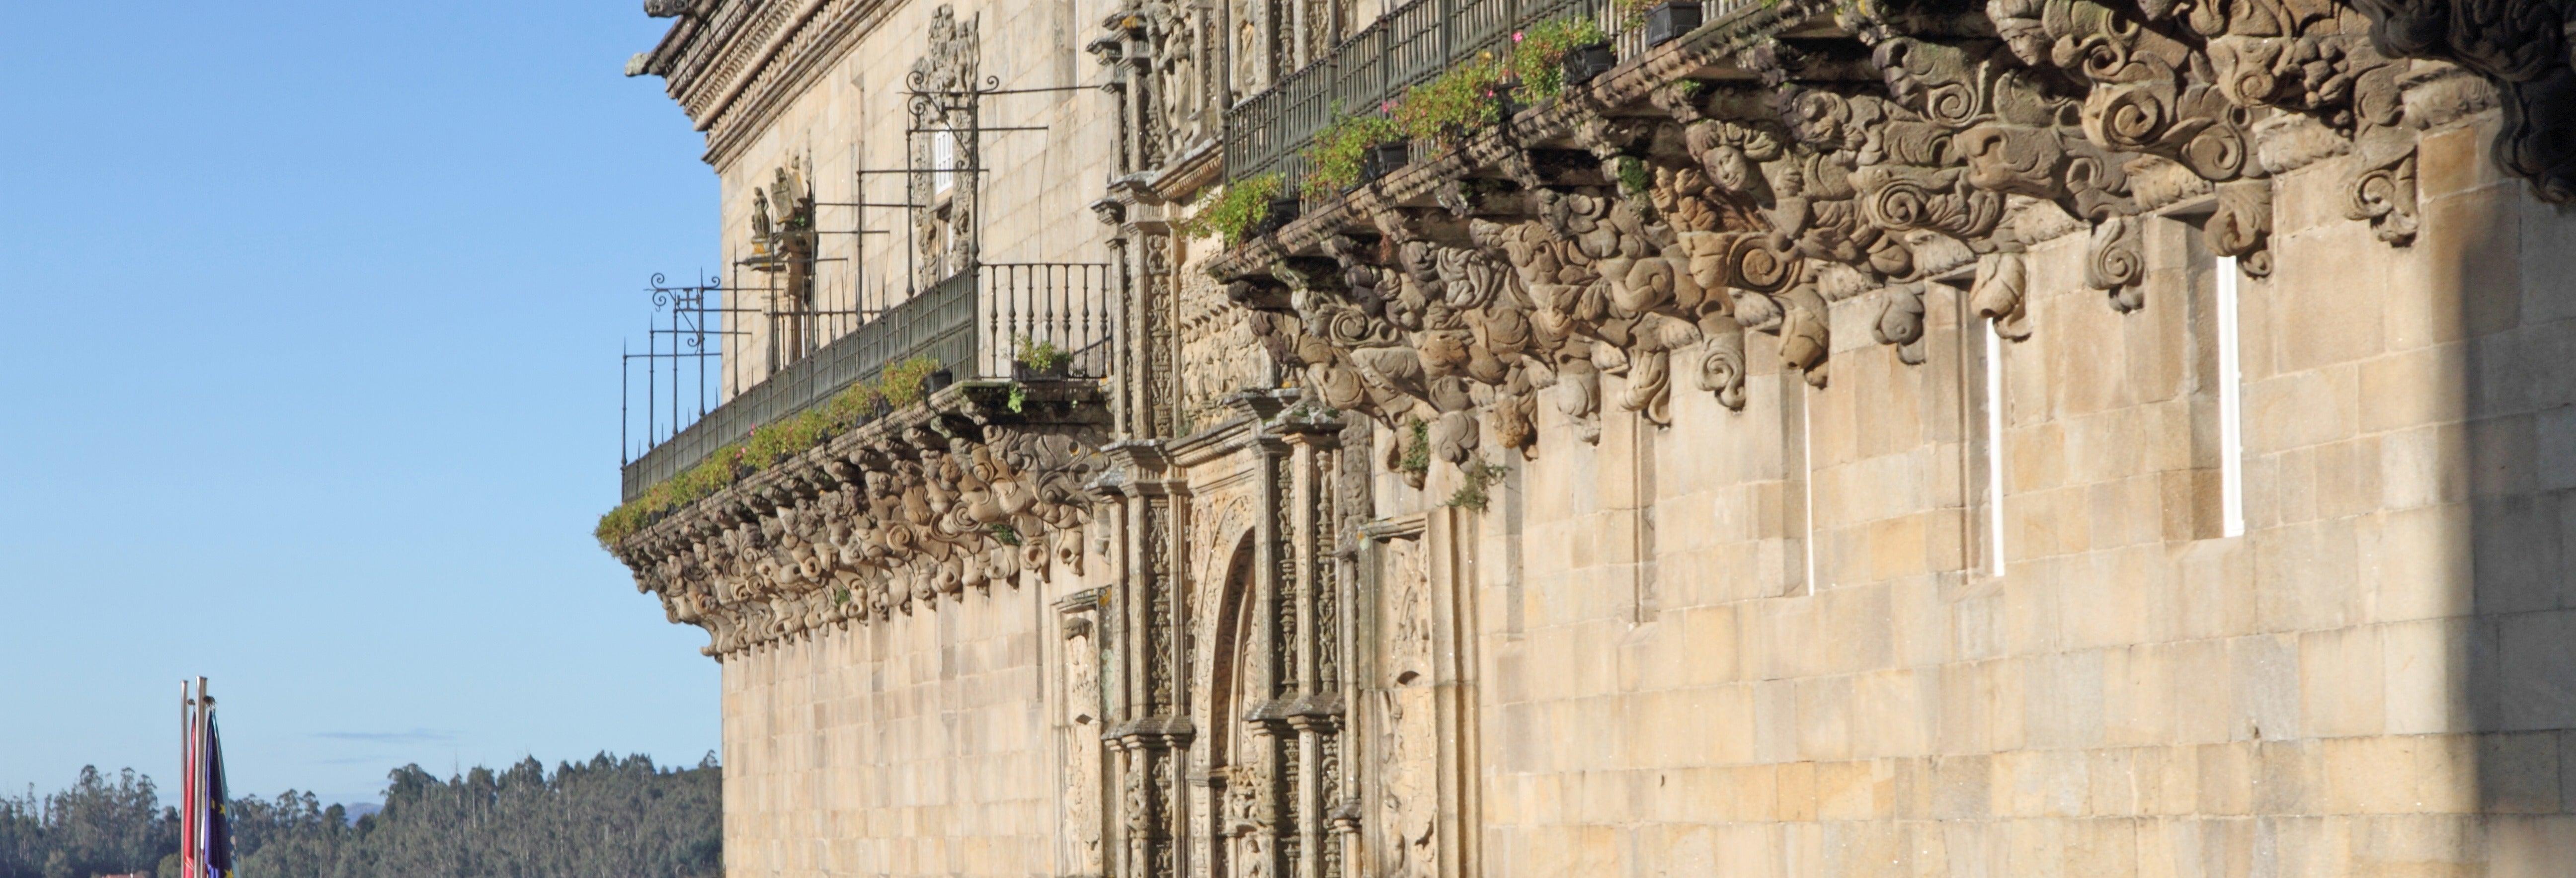 Tour dell'Hostal de los Reyes Católicos